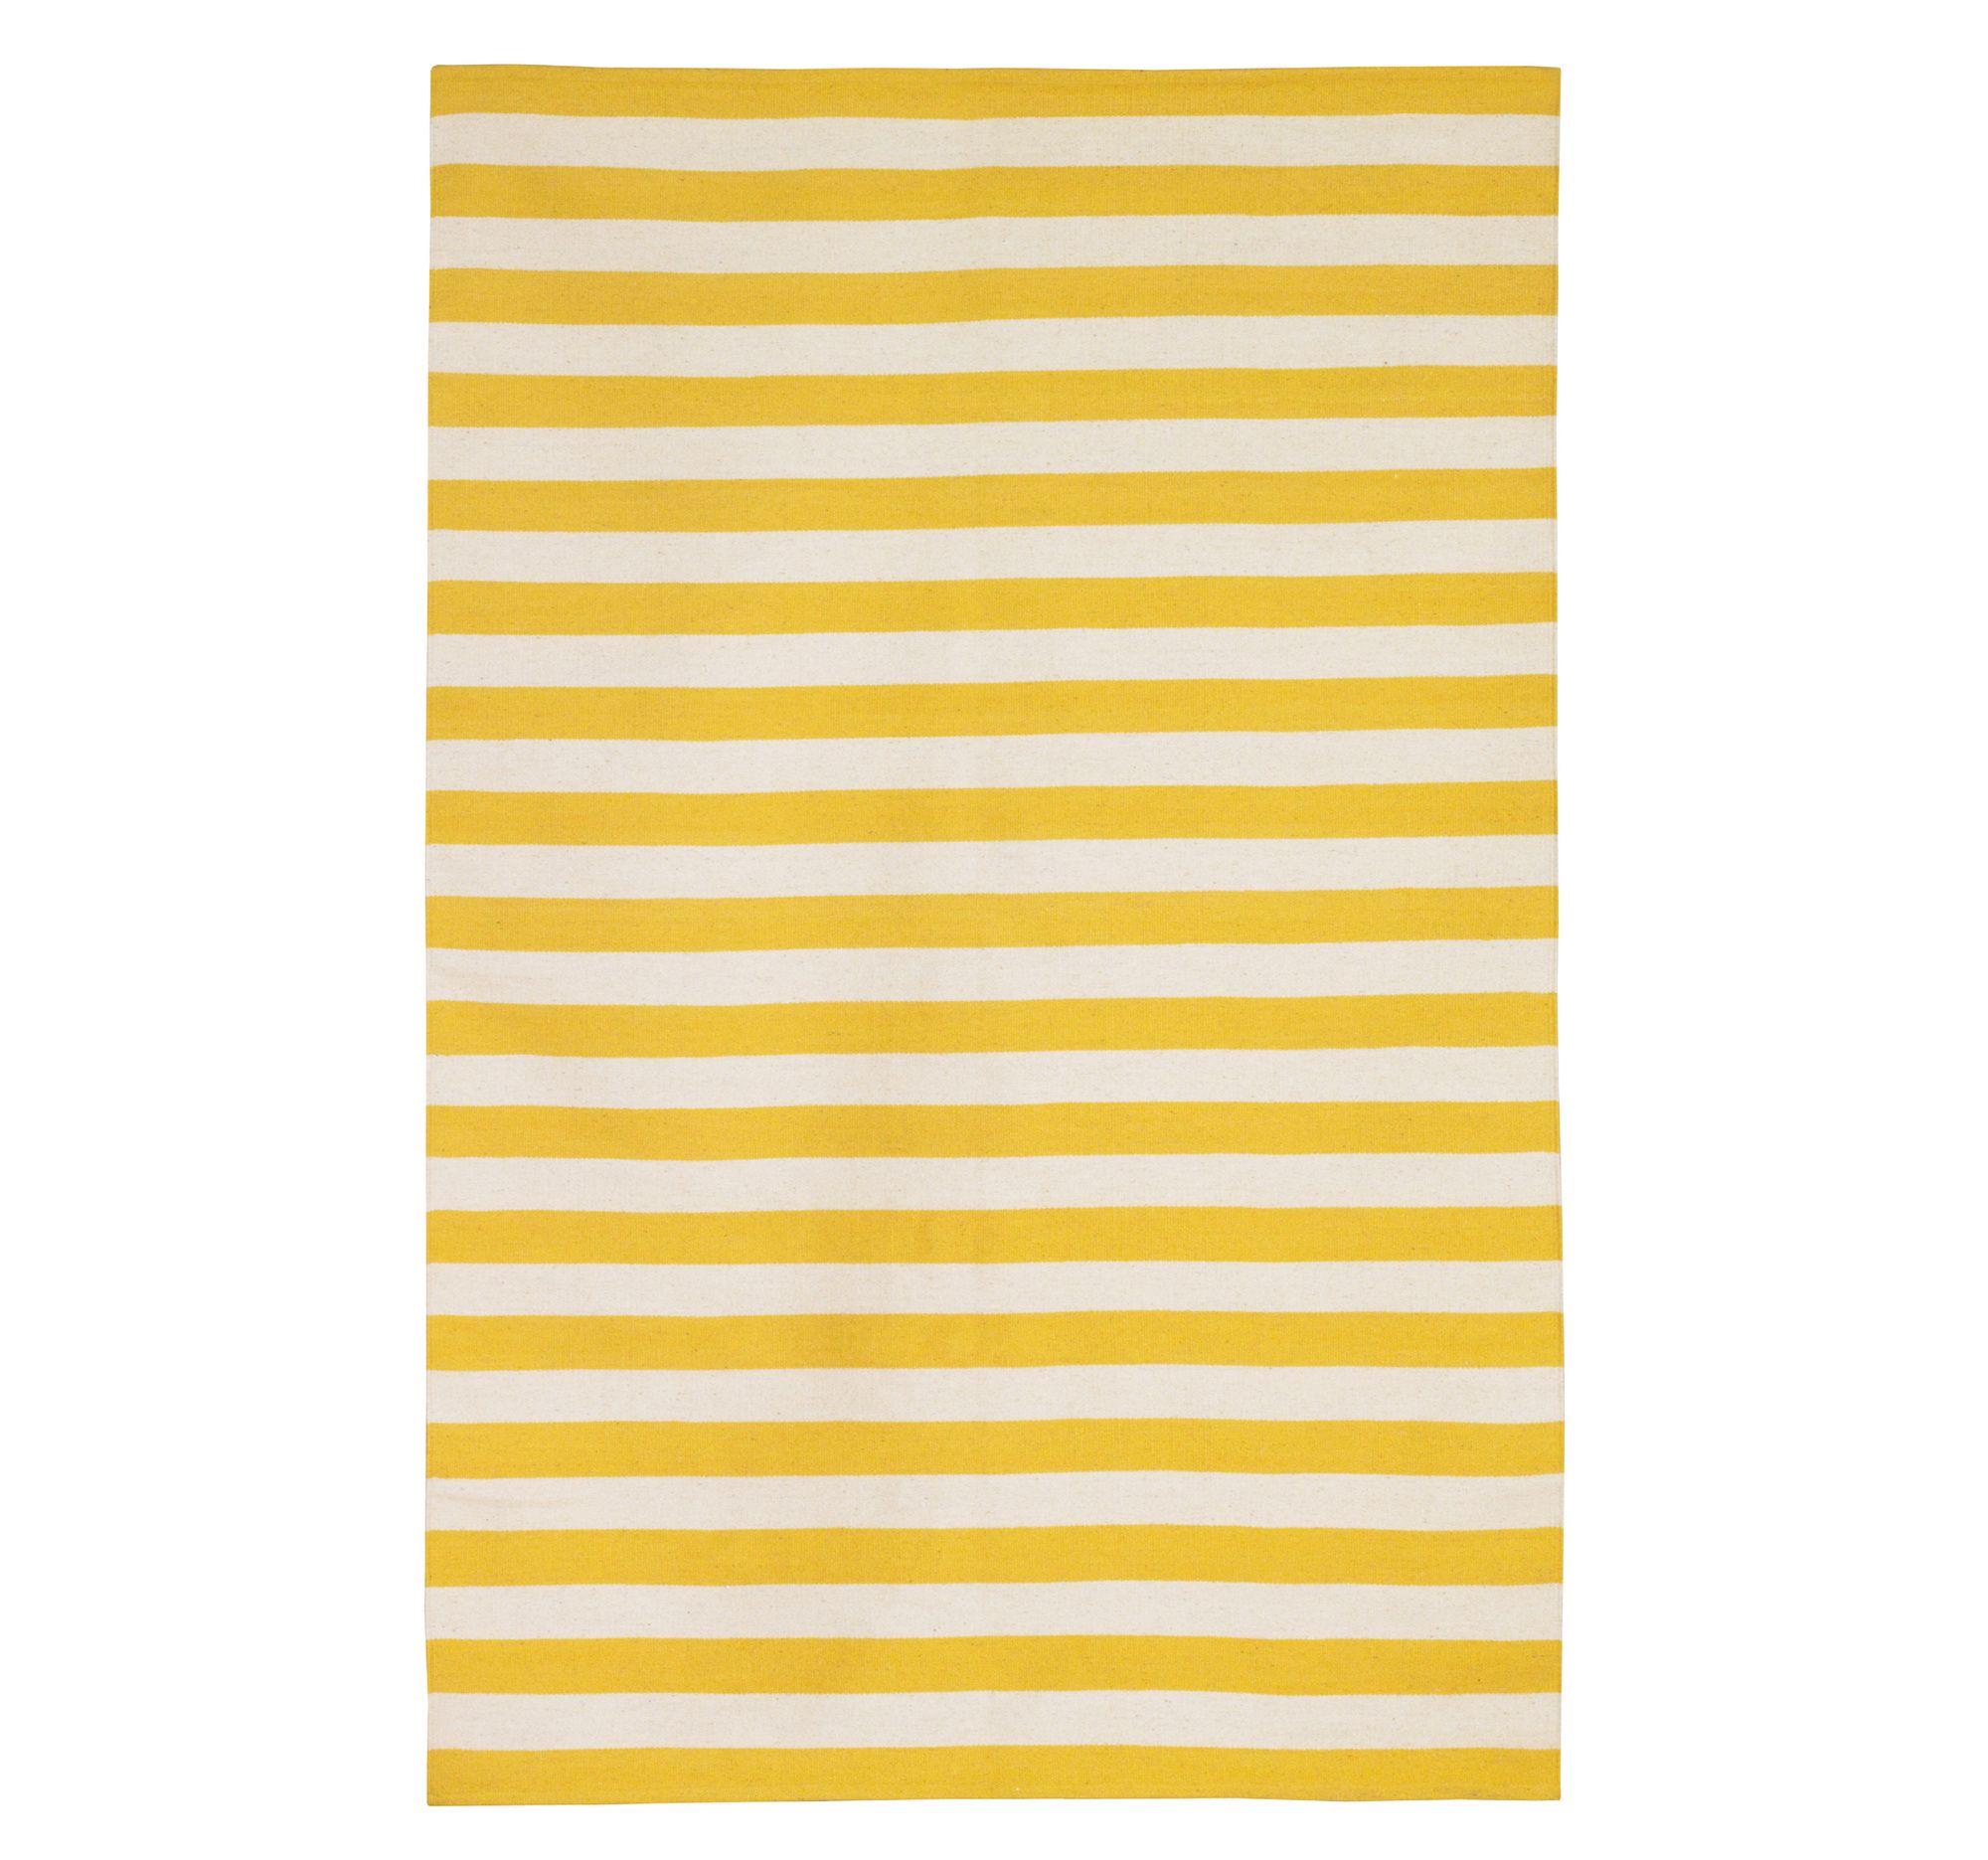 Awesome DwellStudio Draper Stripe Citrine Rug Design